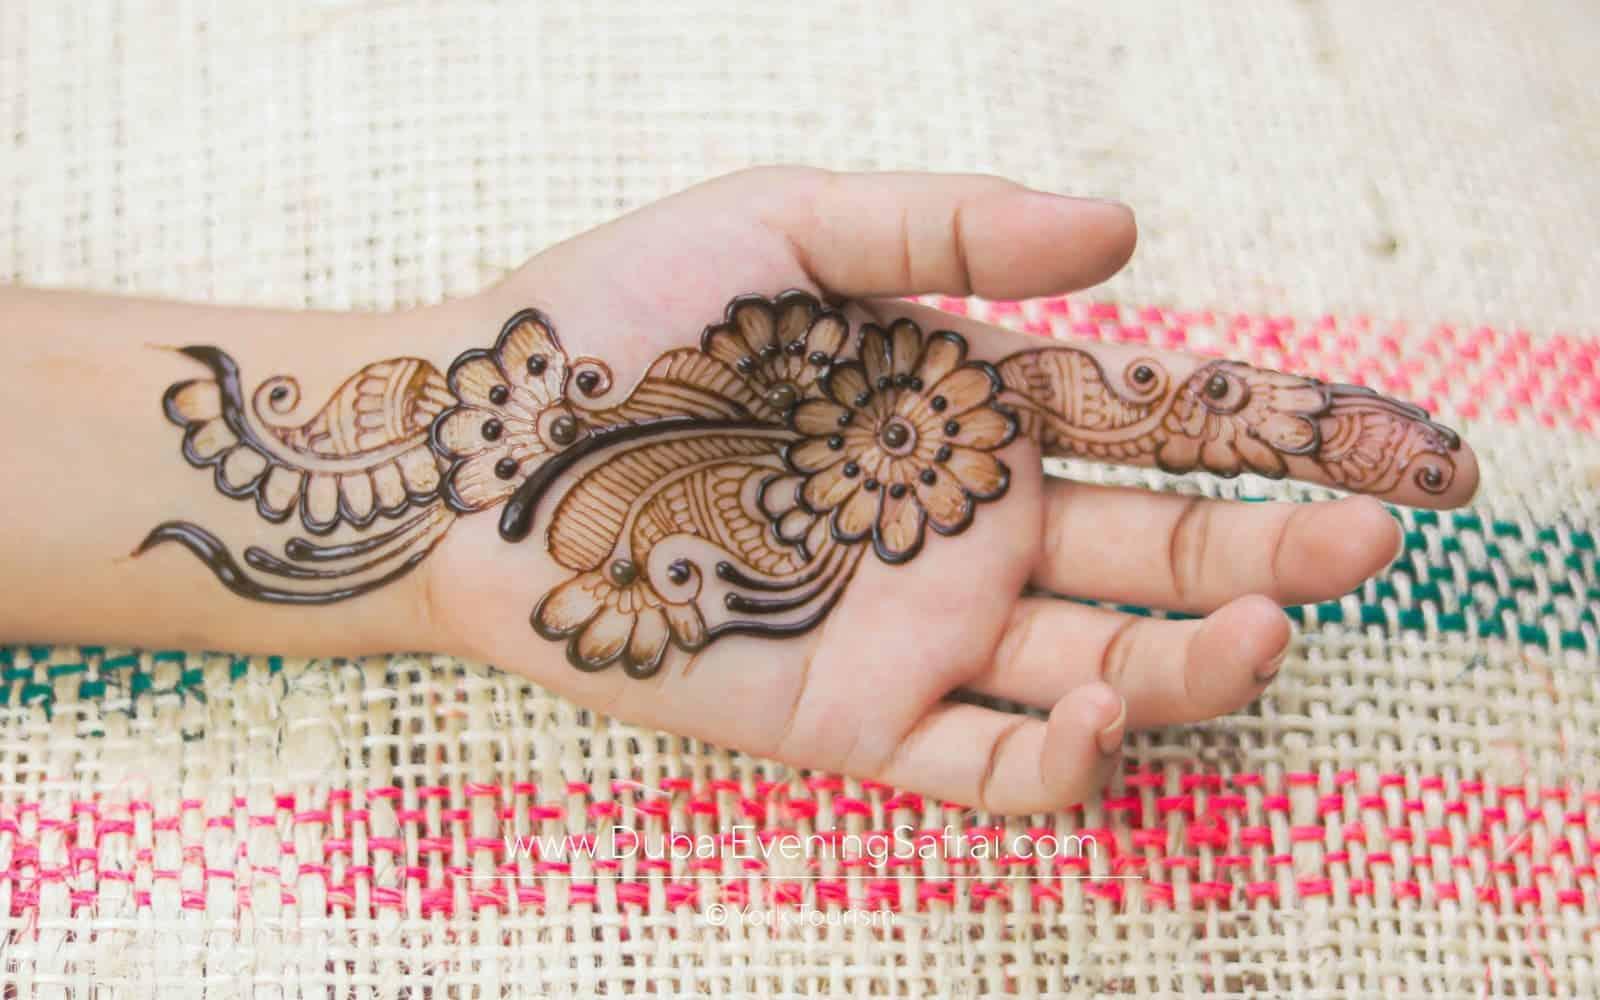 henna art in desert safari